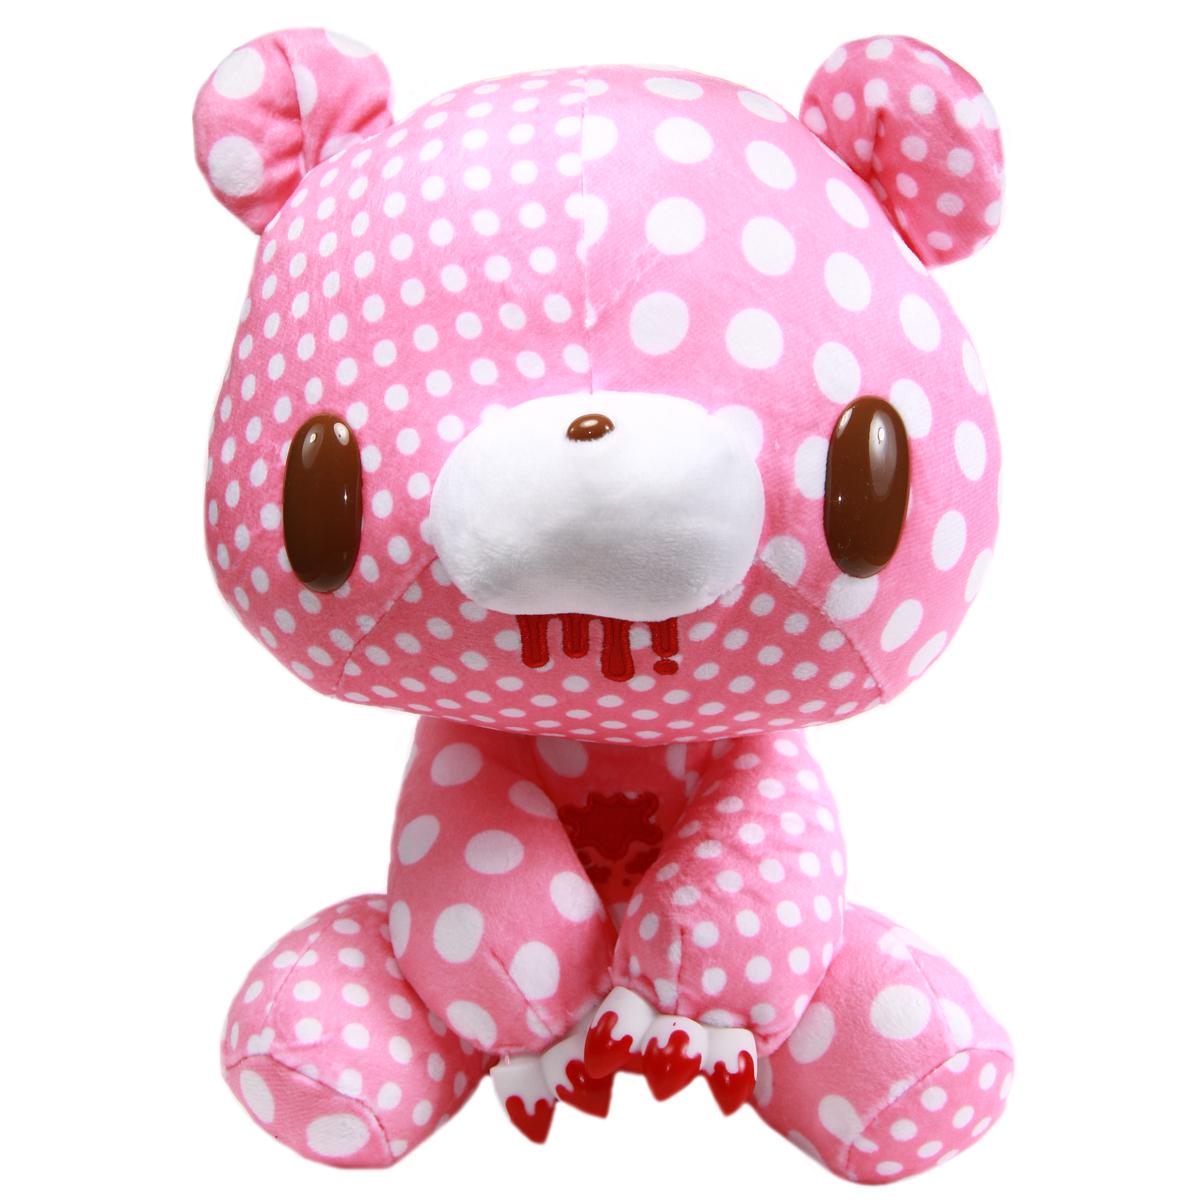 Taito Textillic Crazy Dots Gloomy Bear Plush Doll Pink White GP #556 12 Inches